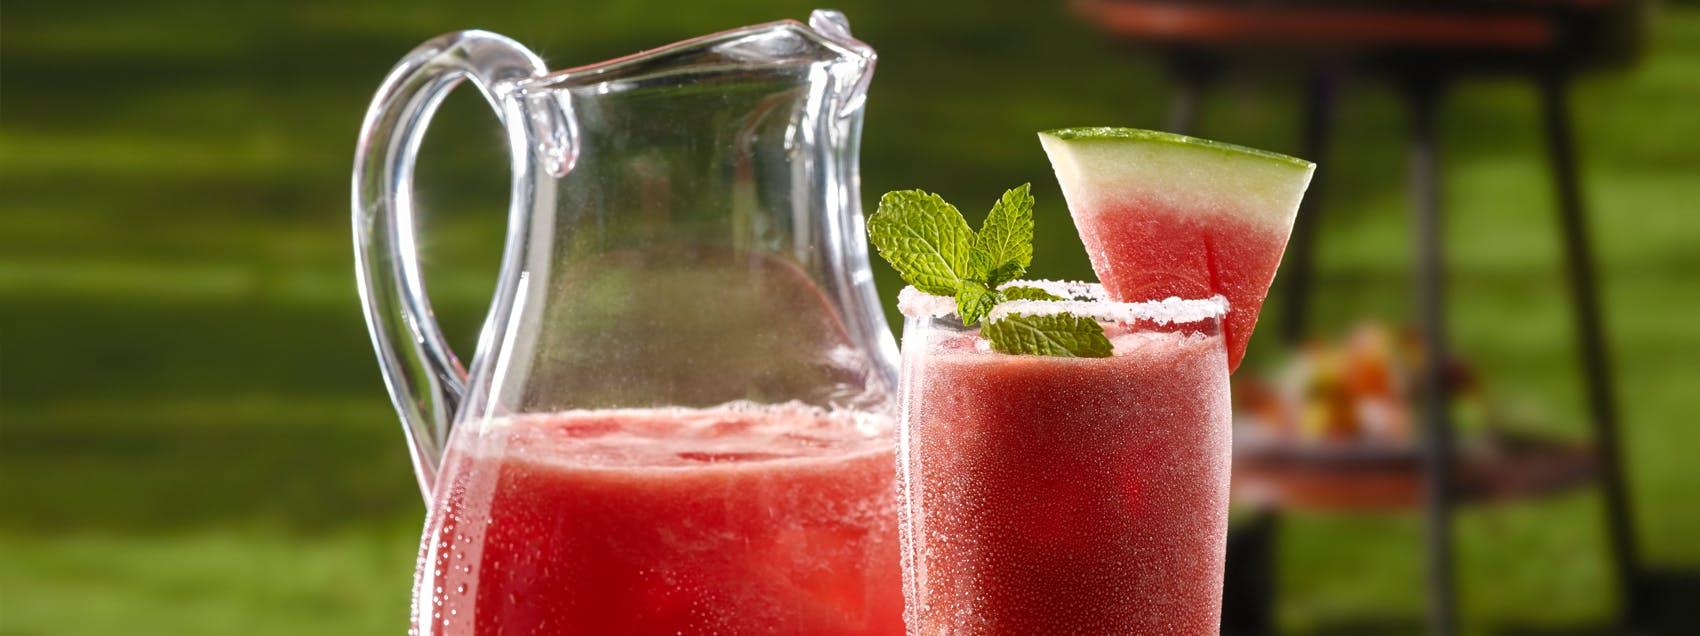 Sauza Watermelon Margarita